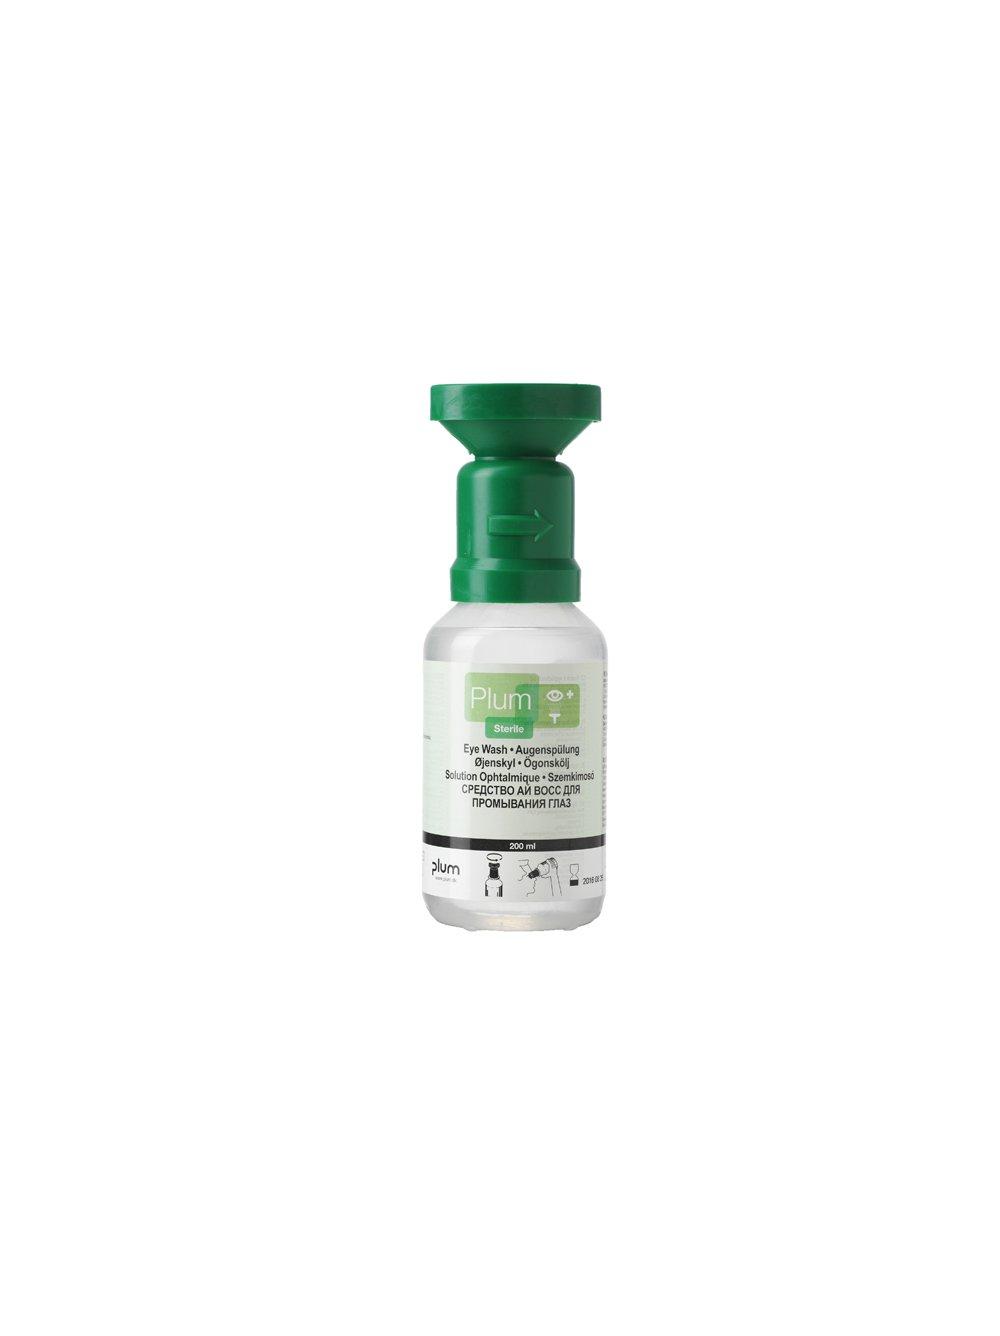 Plum 200ml Saline Eyewash Bottle 46918-2